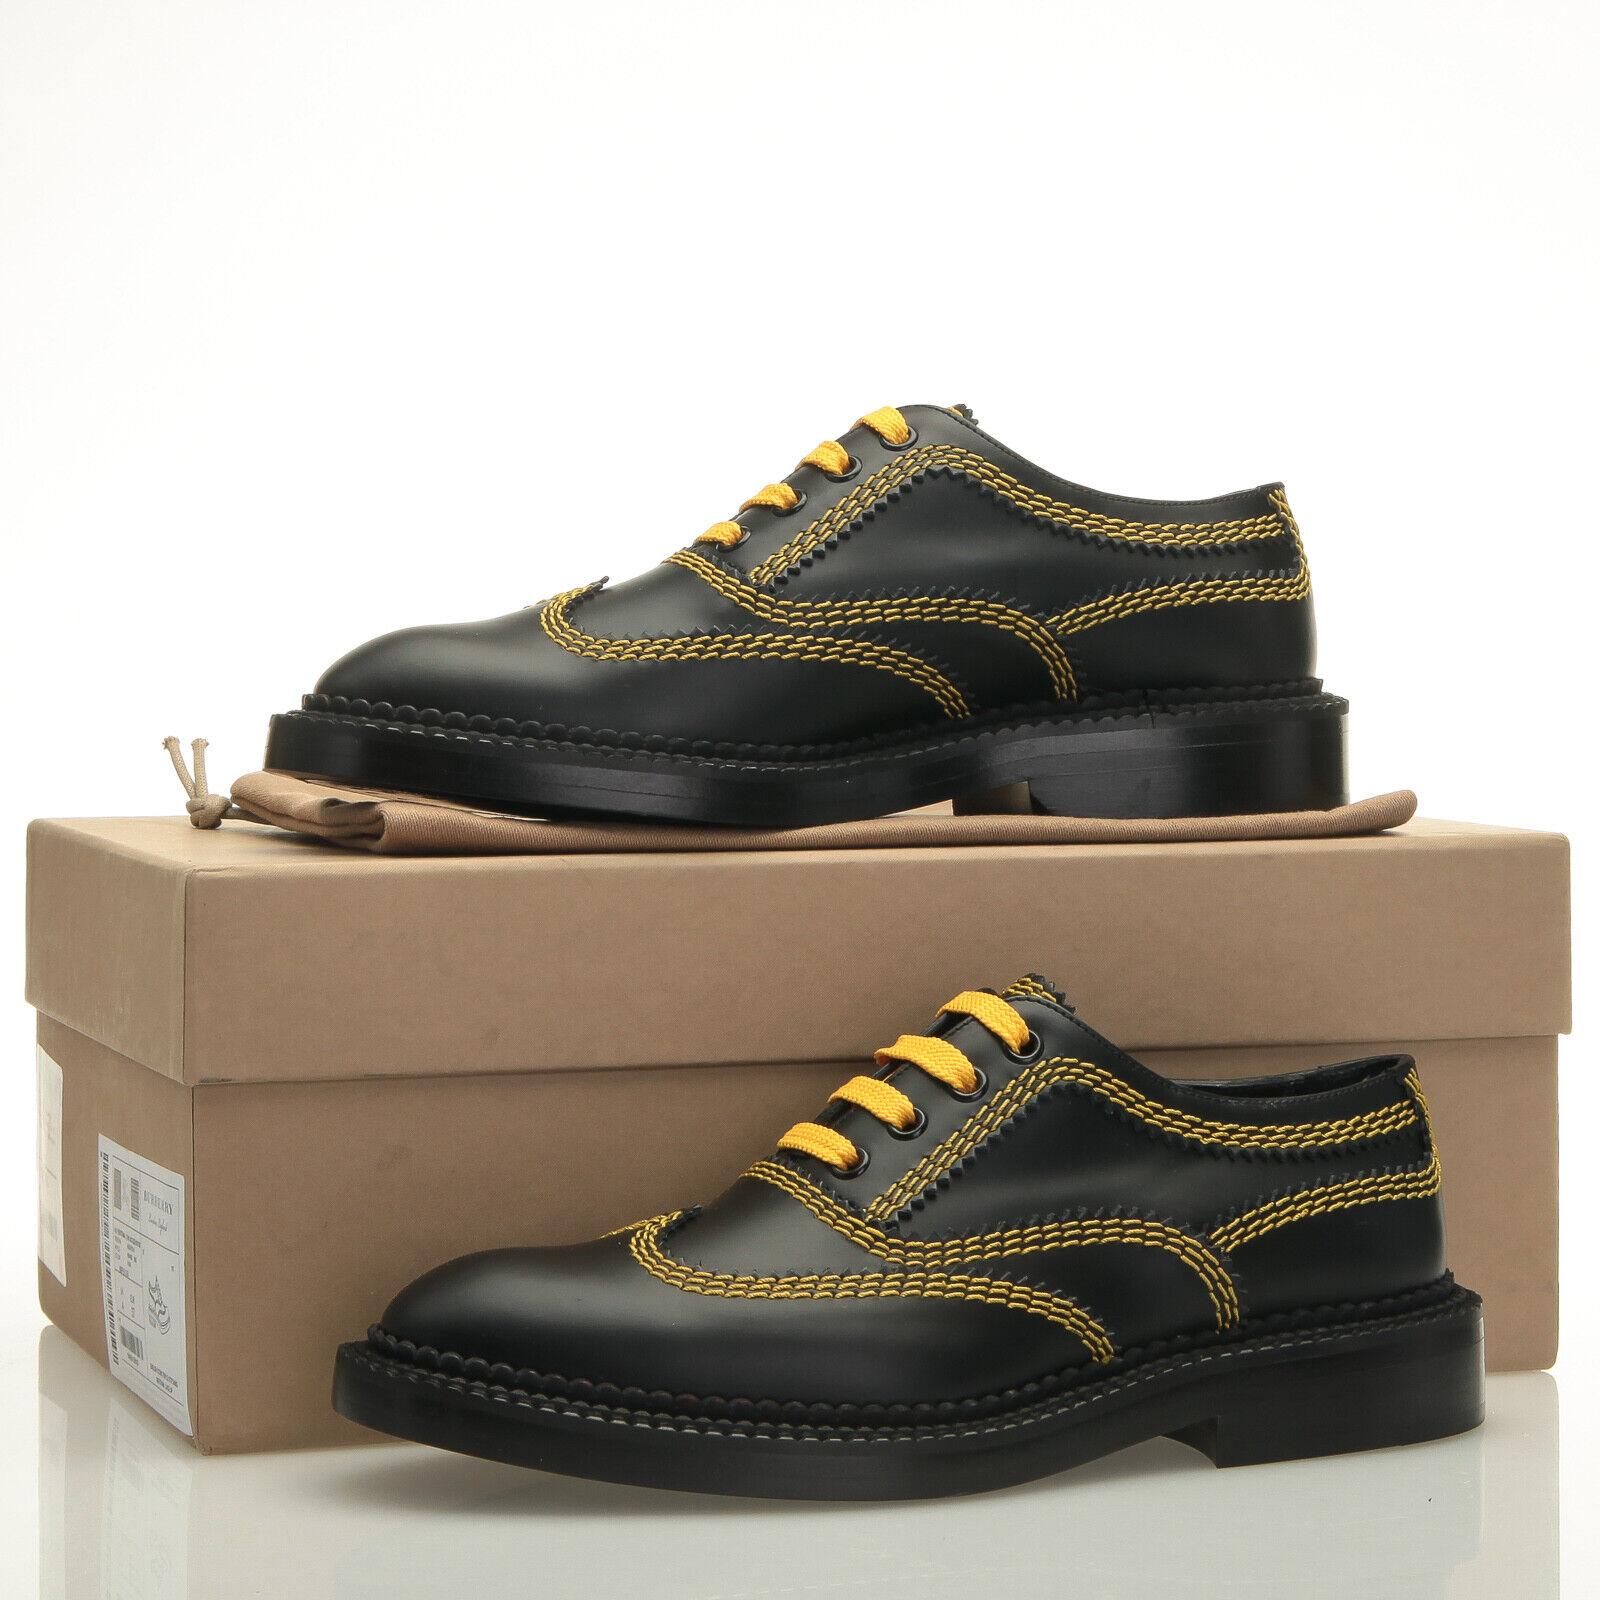 BURBERRY Bertram cuir noir jaune surpiqûres derbies-Taille 7 7 7 US (37 EU) 6442da